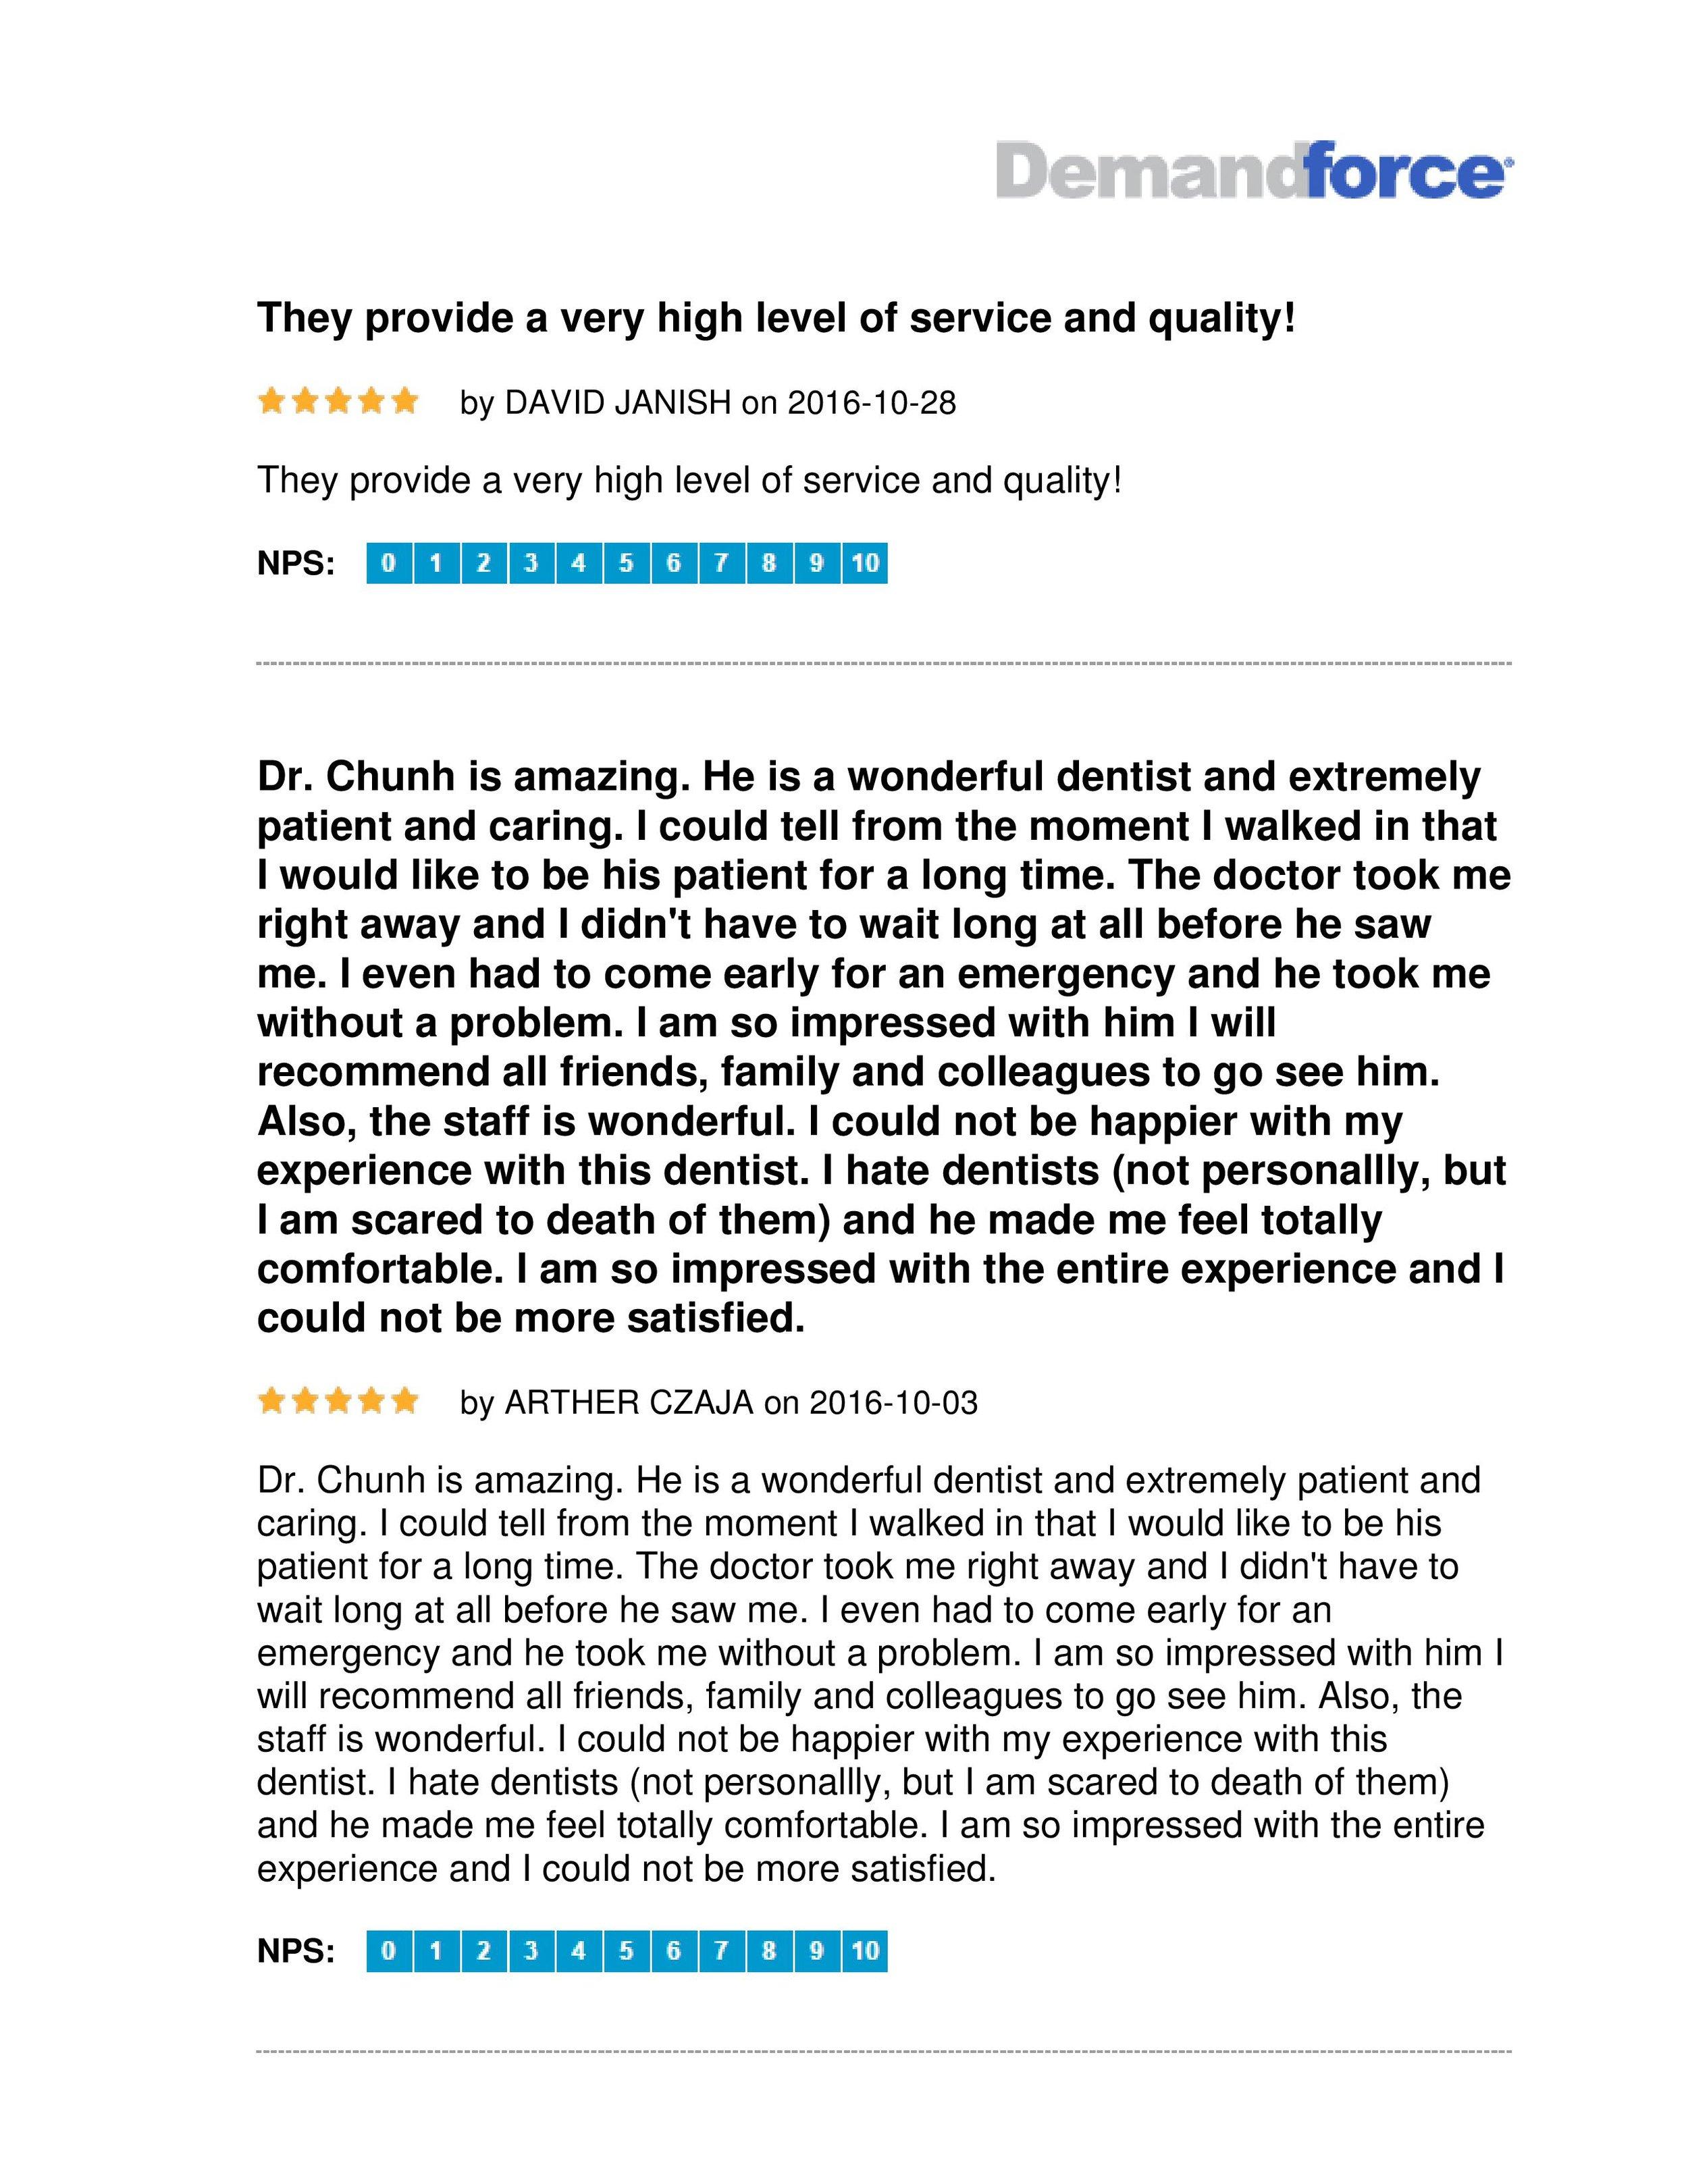 smiles of niles demandforce reviews-page-001.jpg